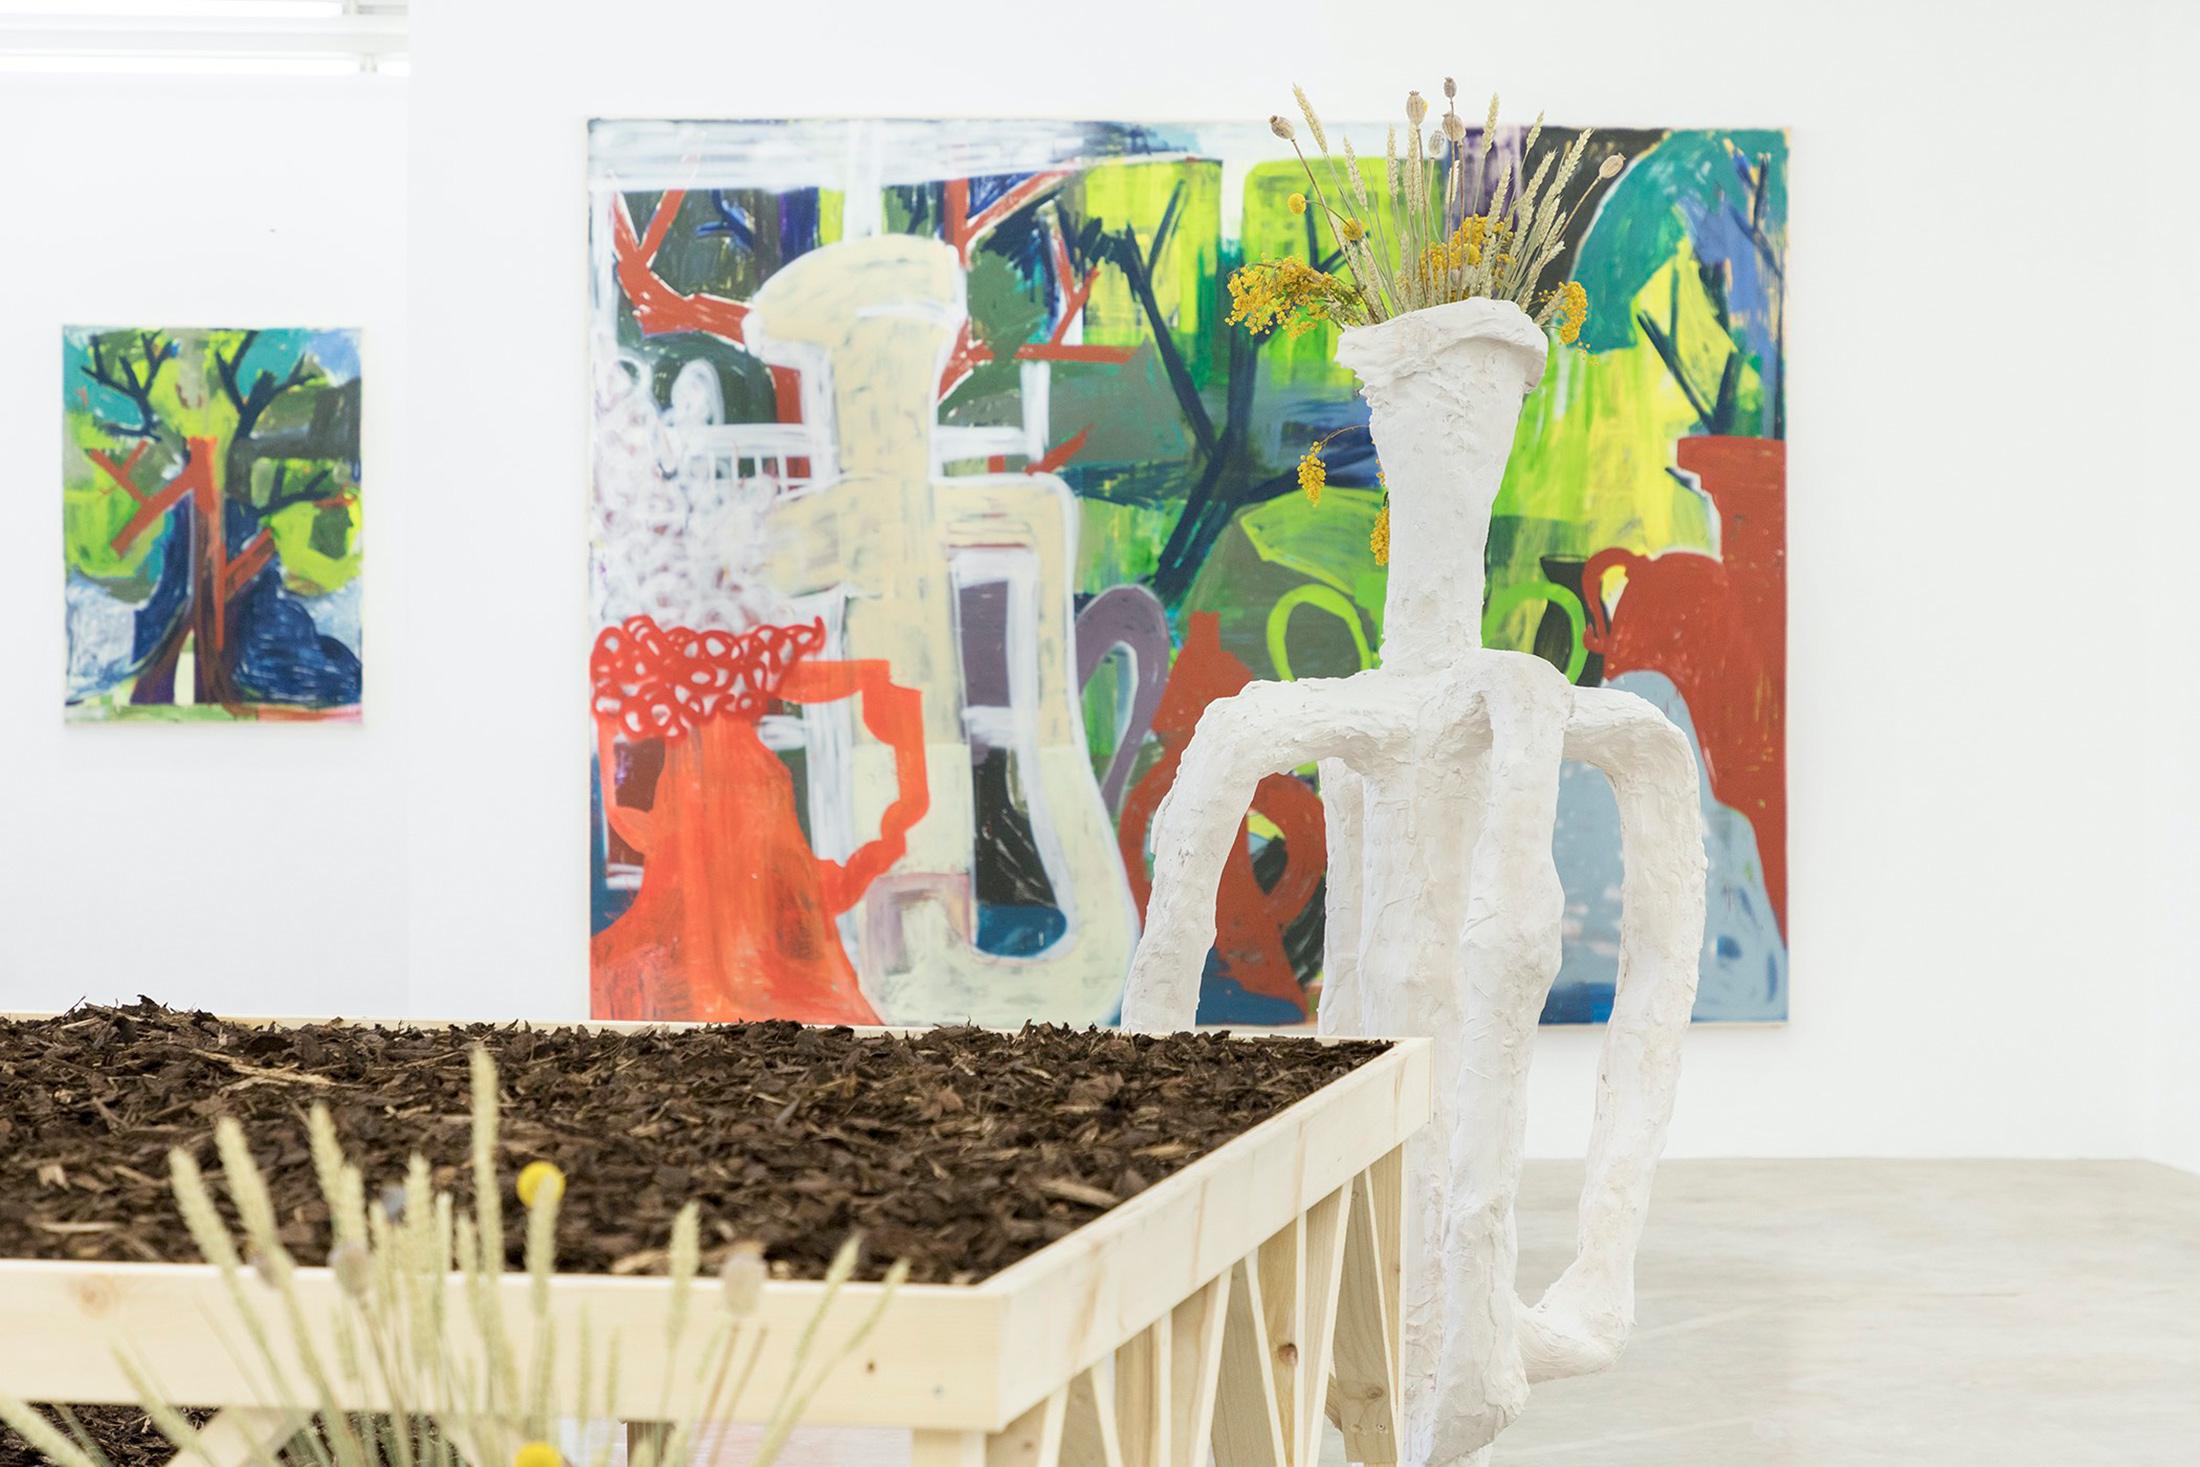 timur lukas, nak, neuer aachener kunstverein, viewing rooms for artists and art galleries